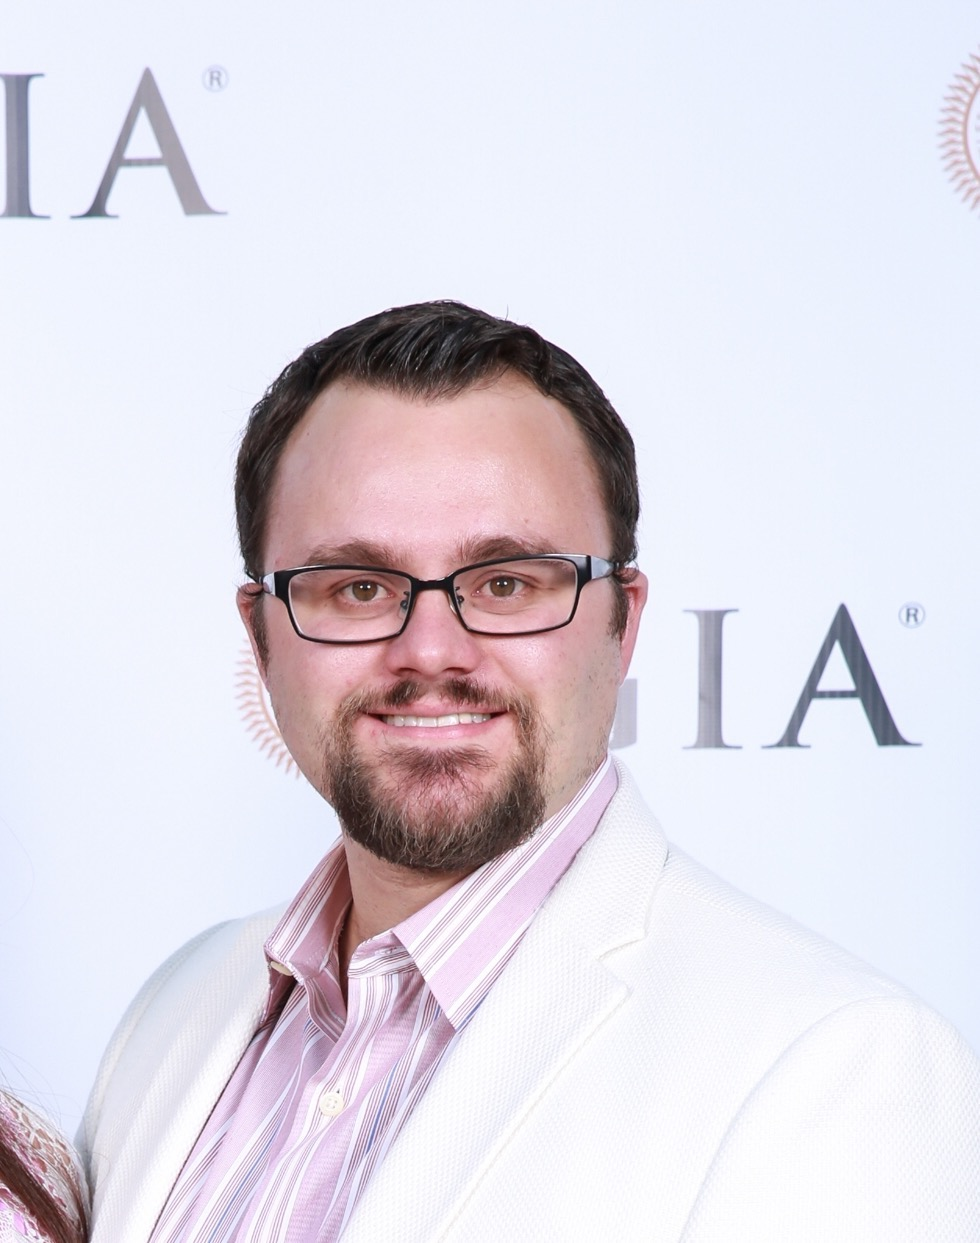 Will Larson, Pala International's go-to person regarding fine minerals.